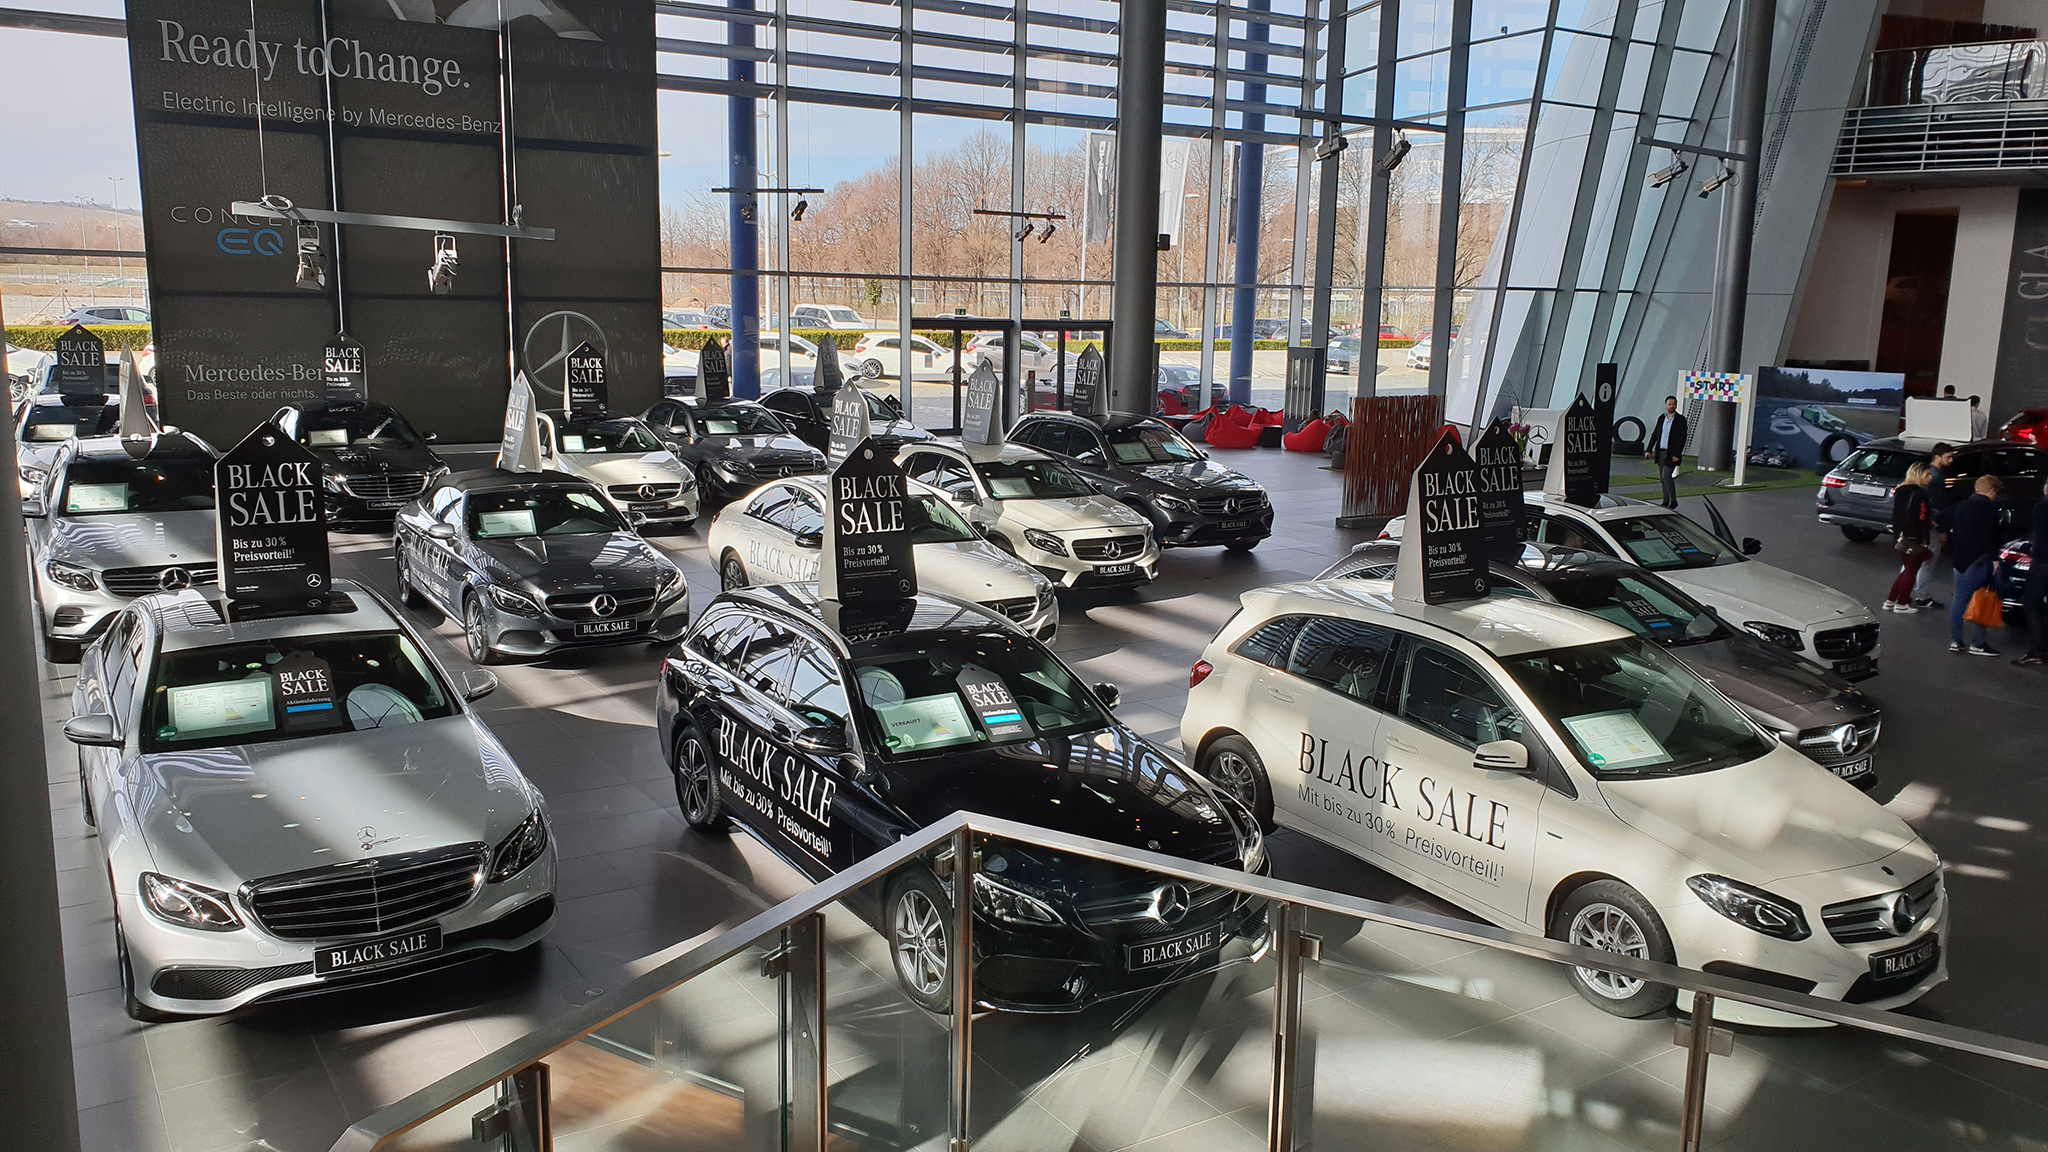 S9-Mercedes-Benz Museum-tinhte-46.jpg